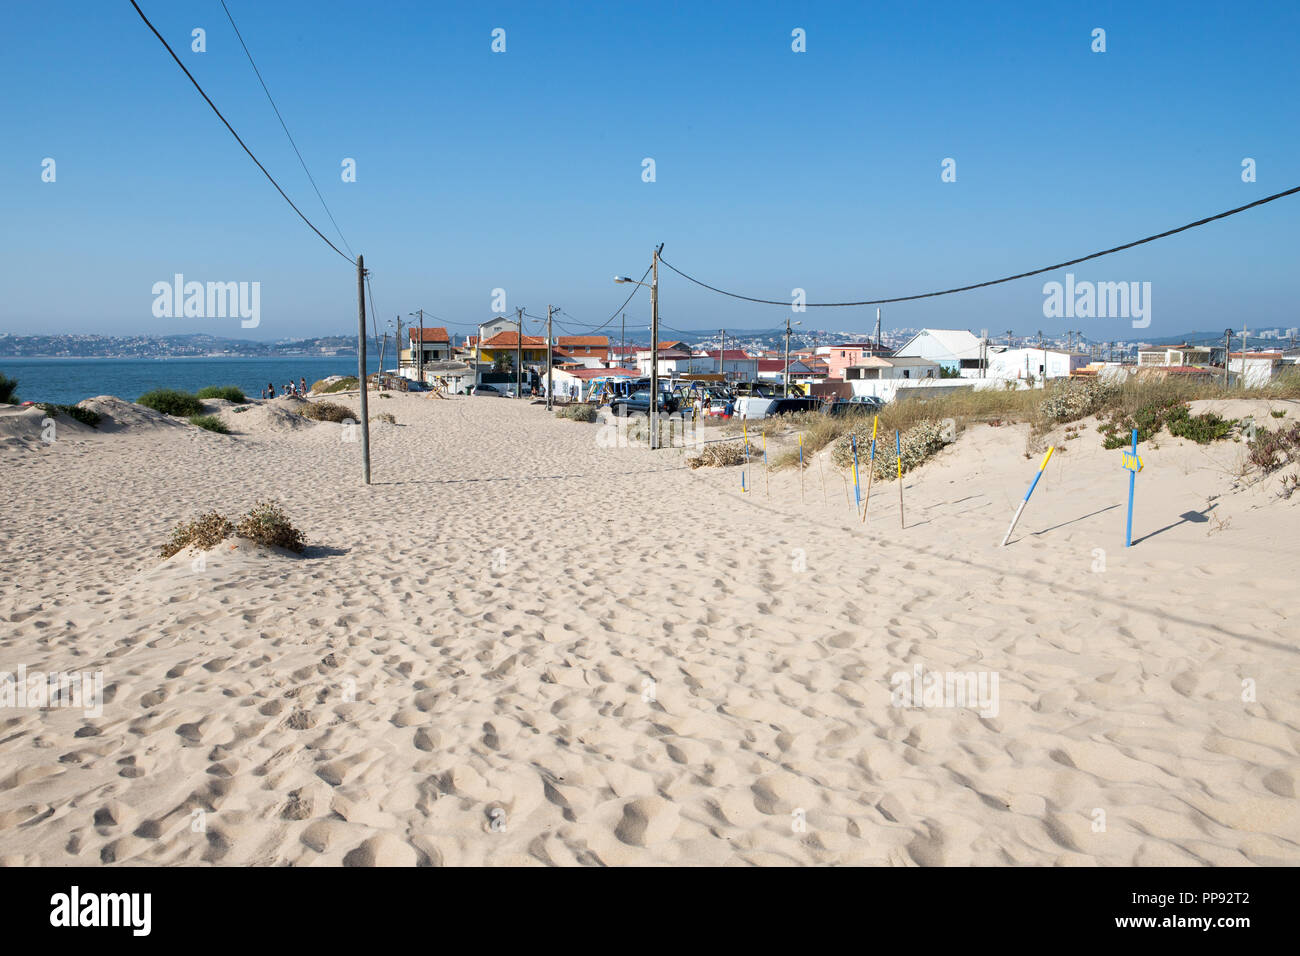 Portugal beach, Cova do Vapor. People - Stock Image